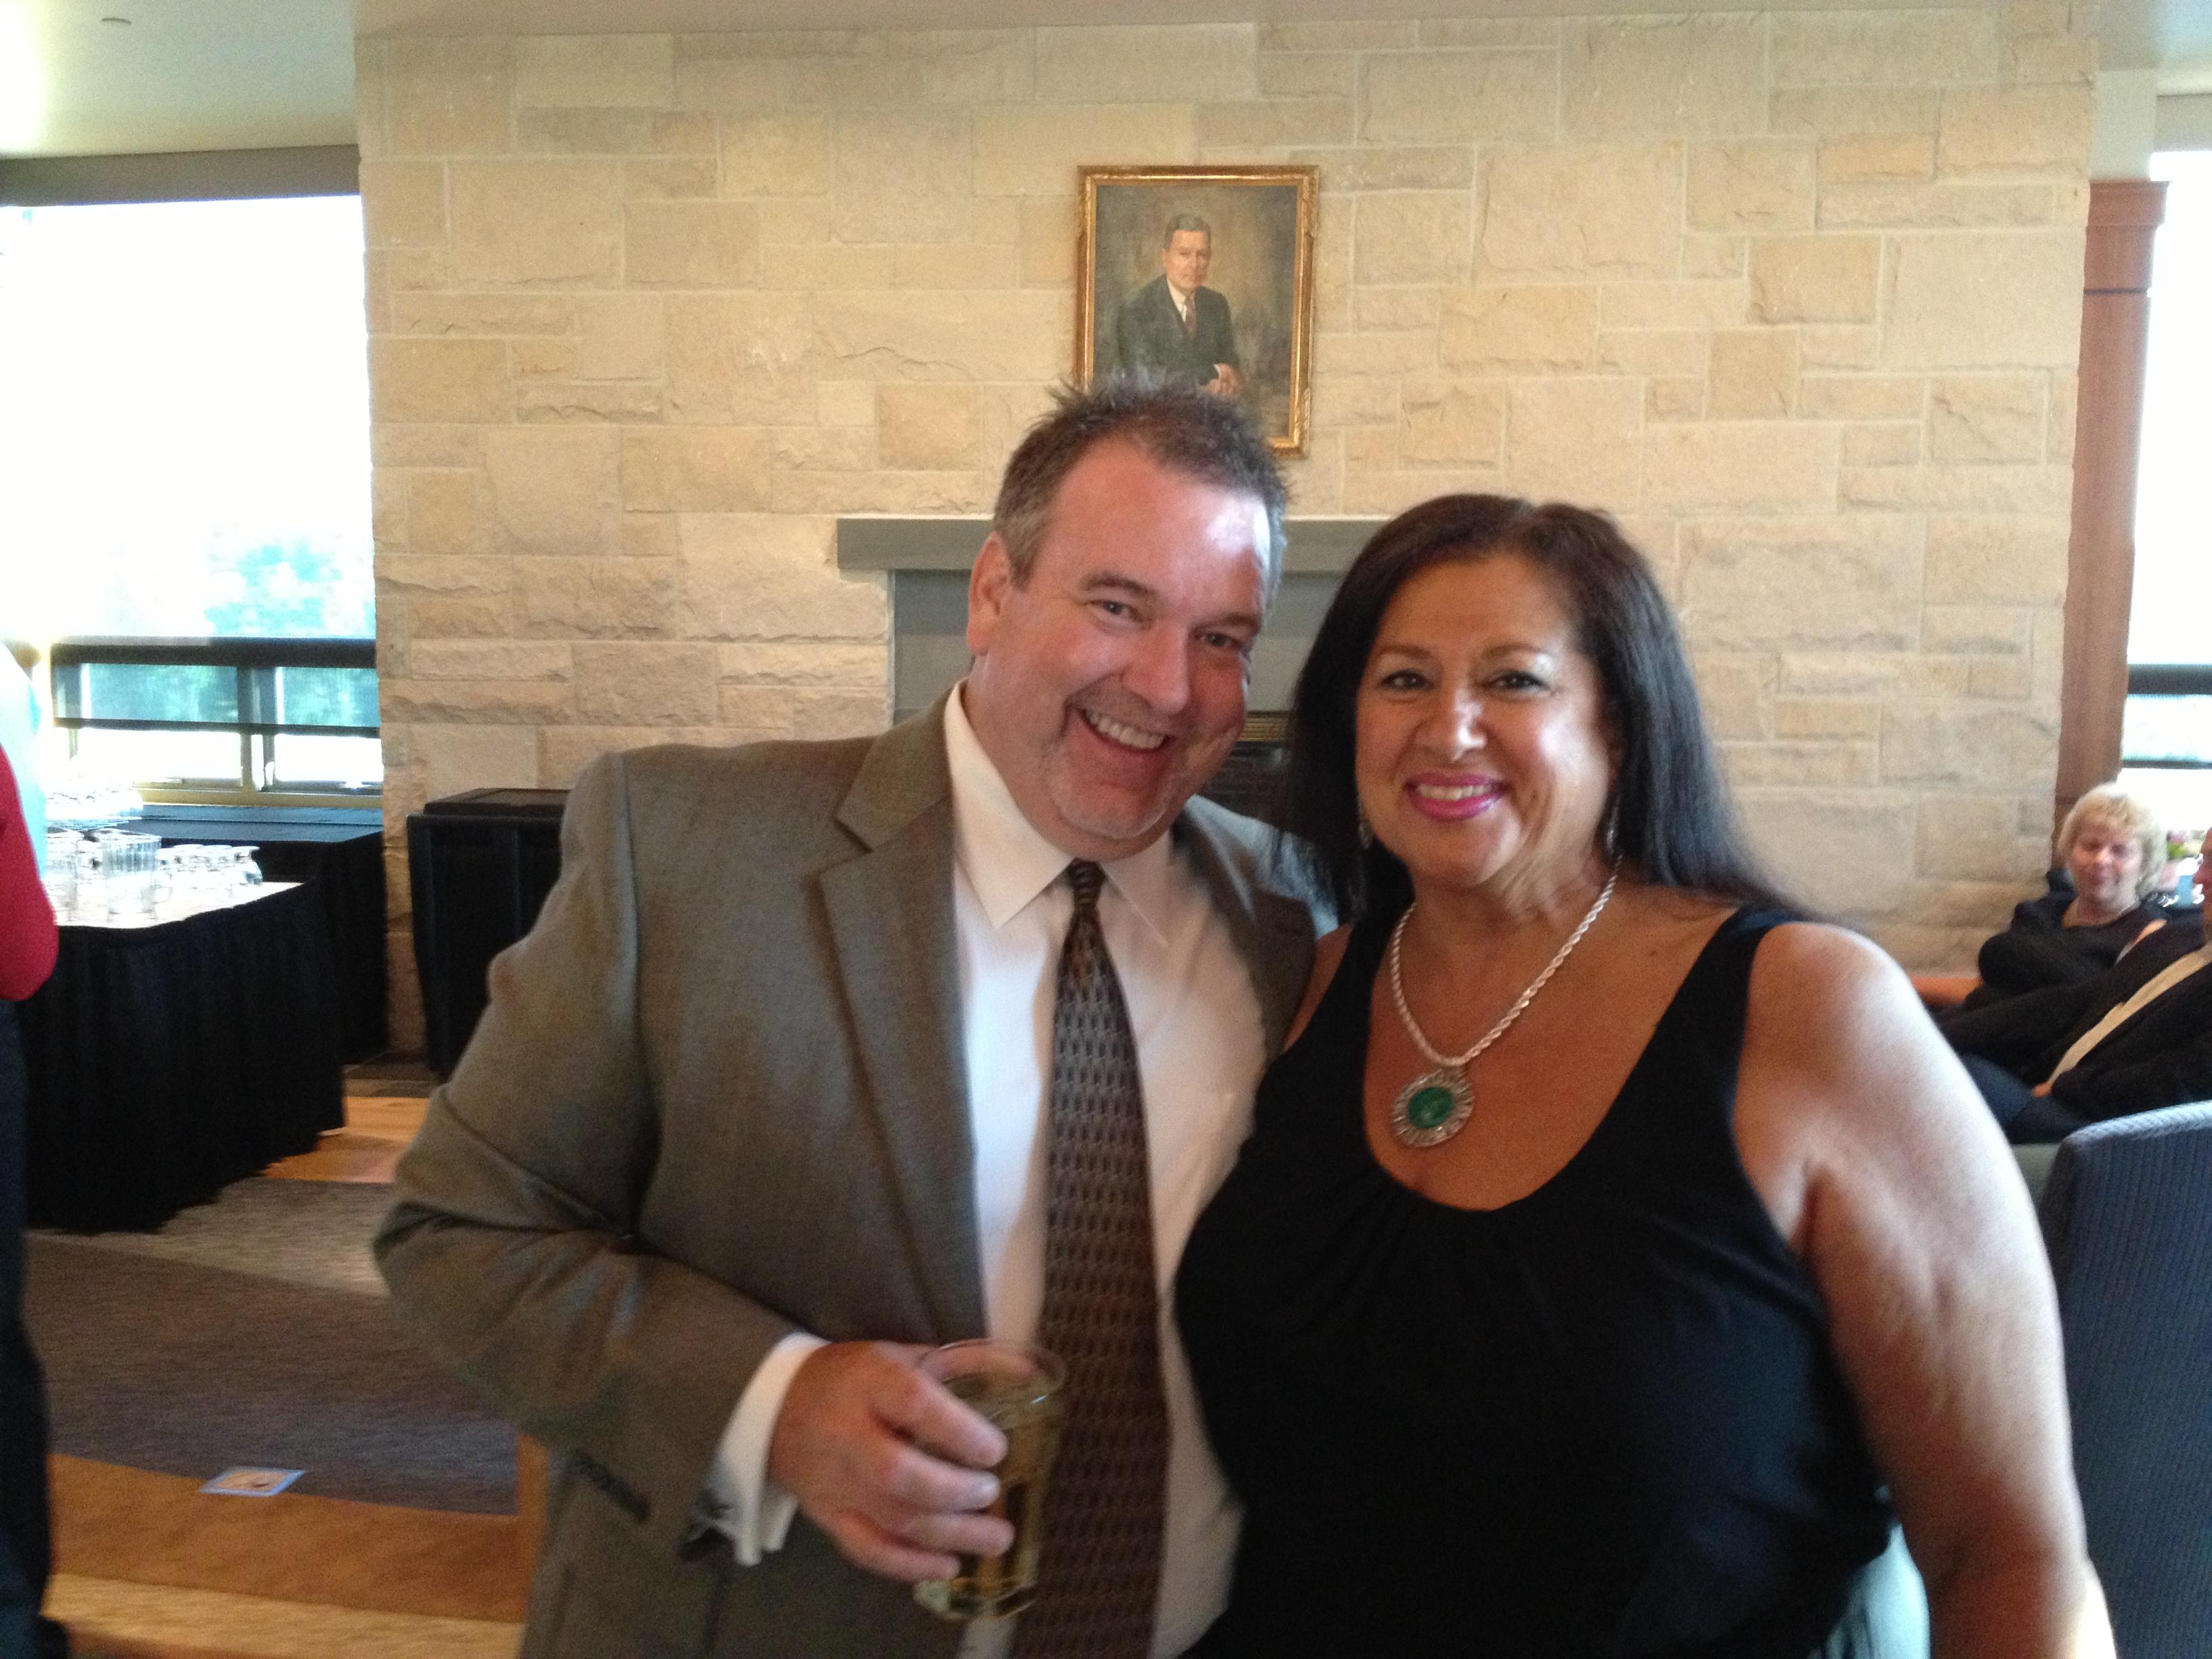 Mike and Kathy Testimonial